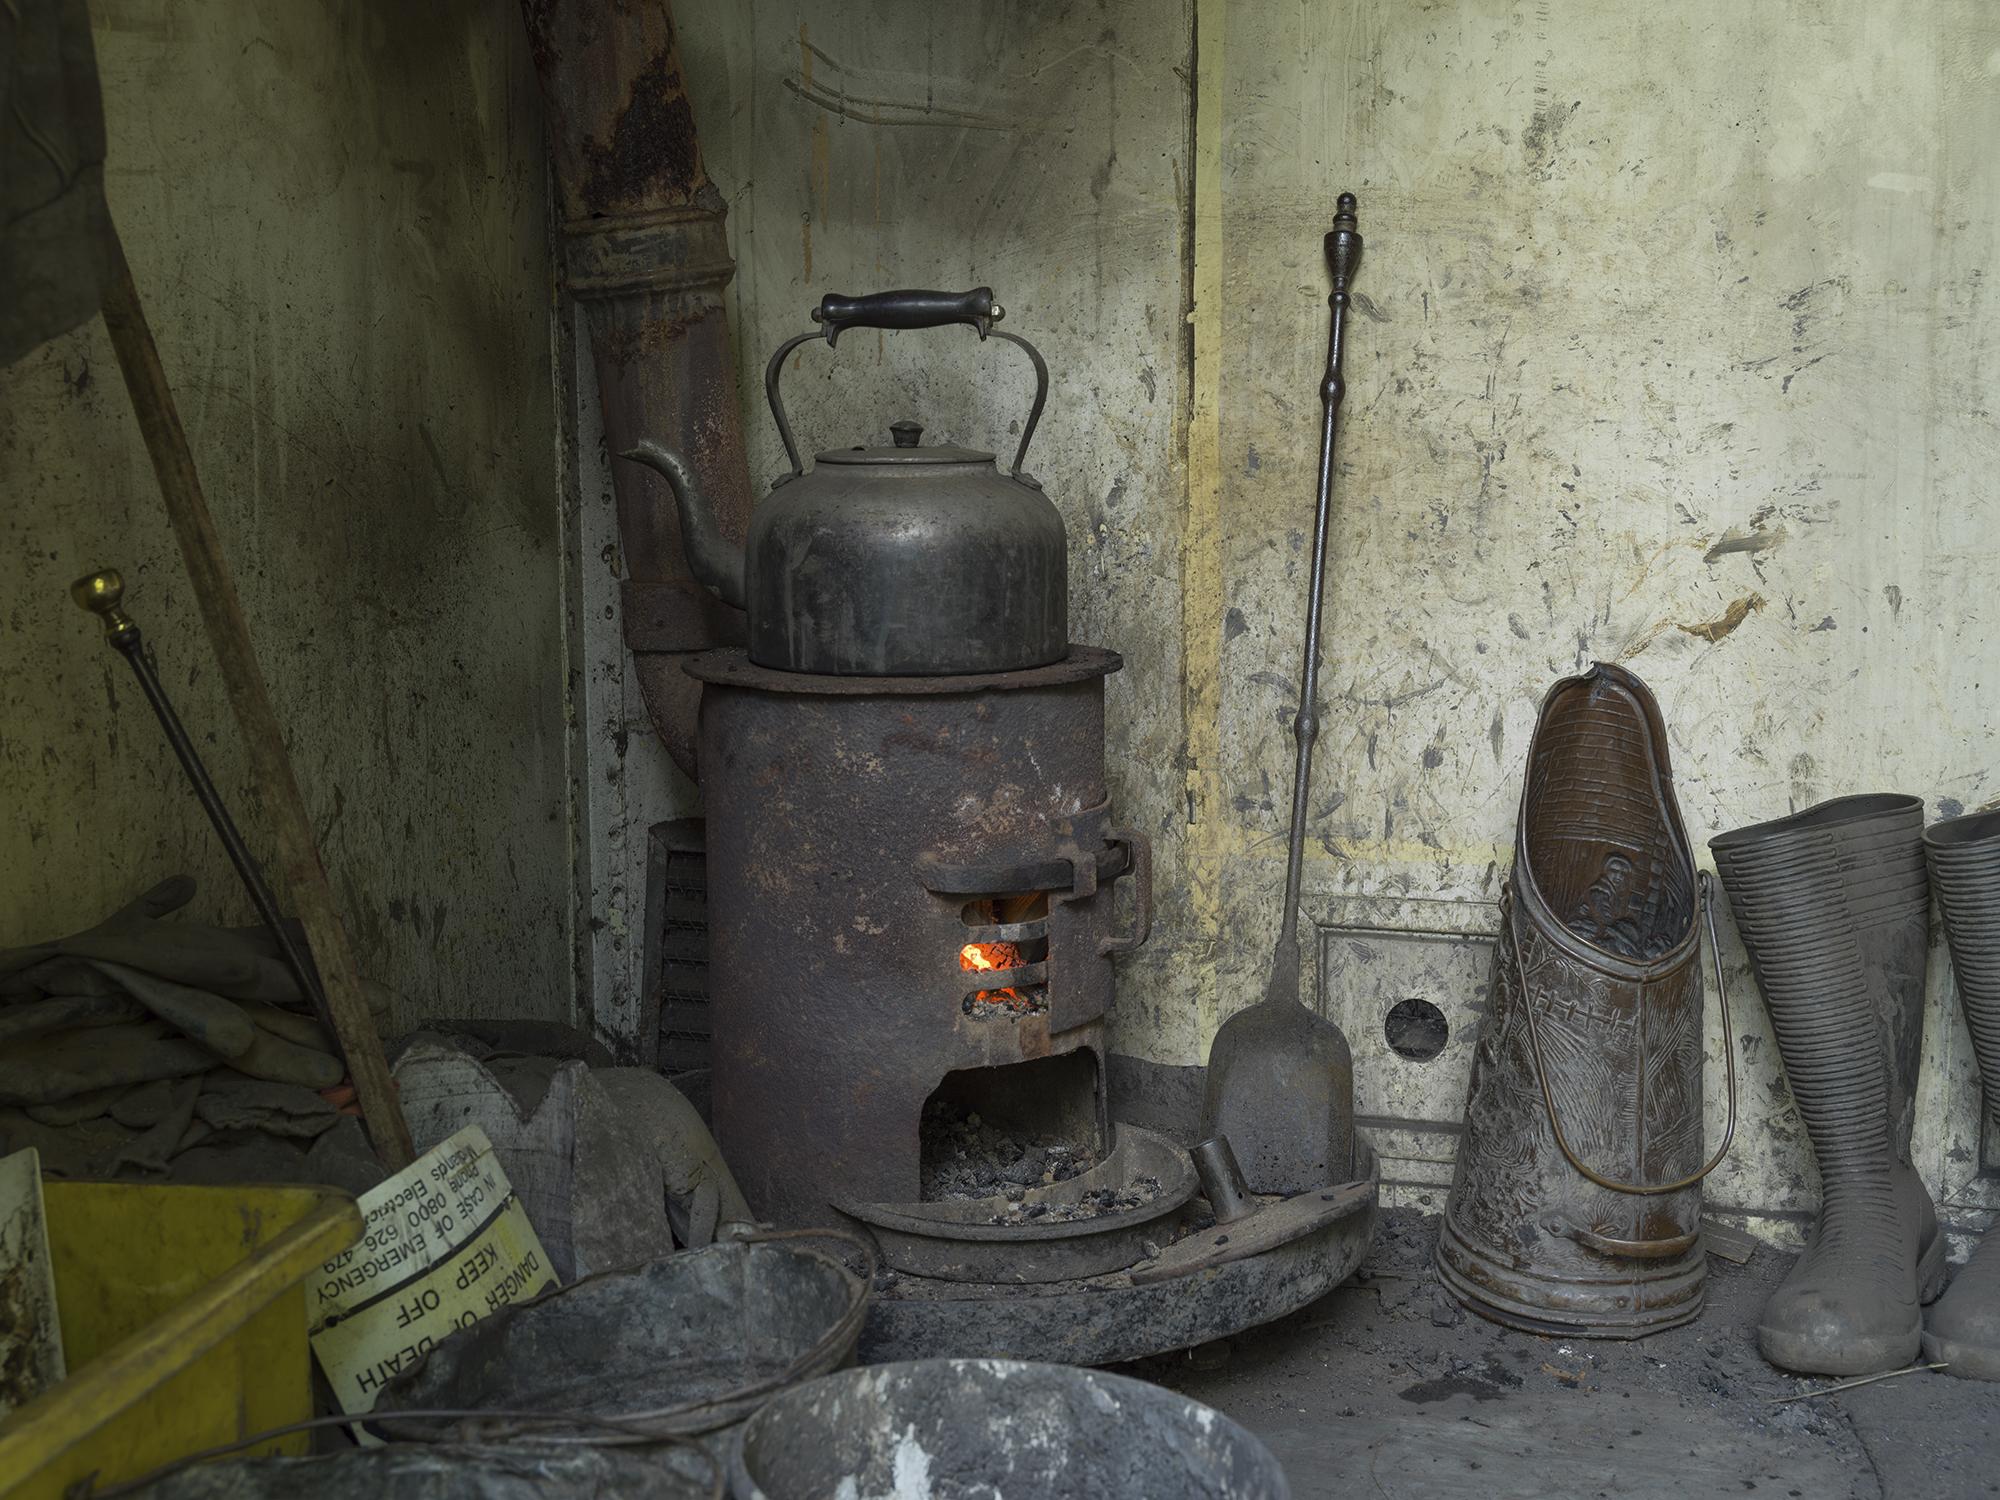 Kettle on stove in mining hut